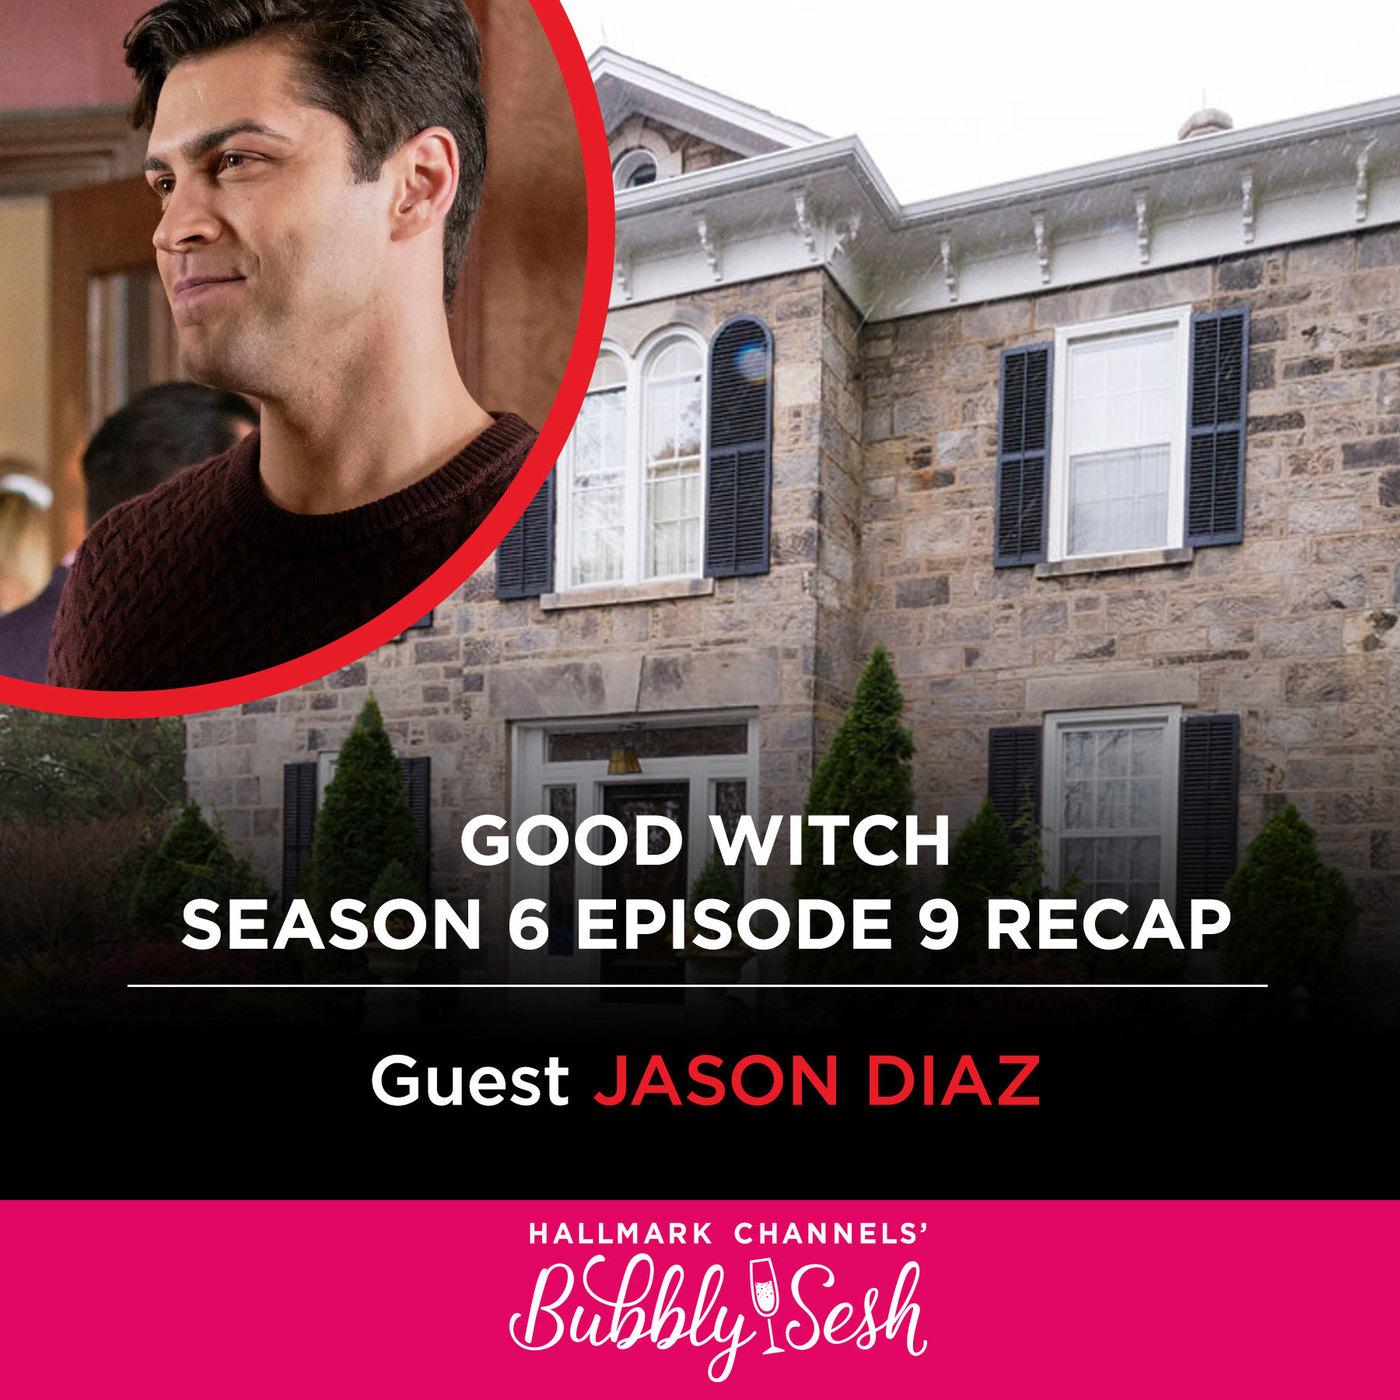 Good Witch Season 6 Episode 9 Recap with Guest Jason Diaz